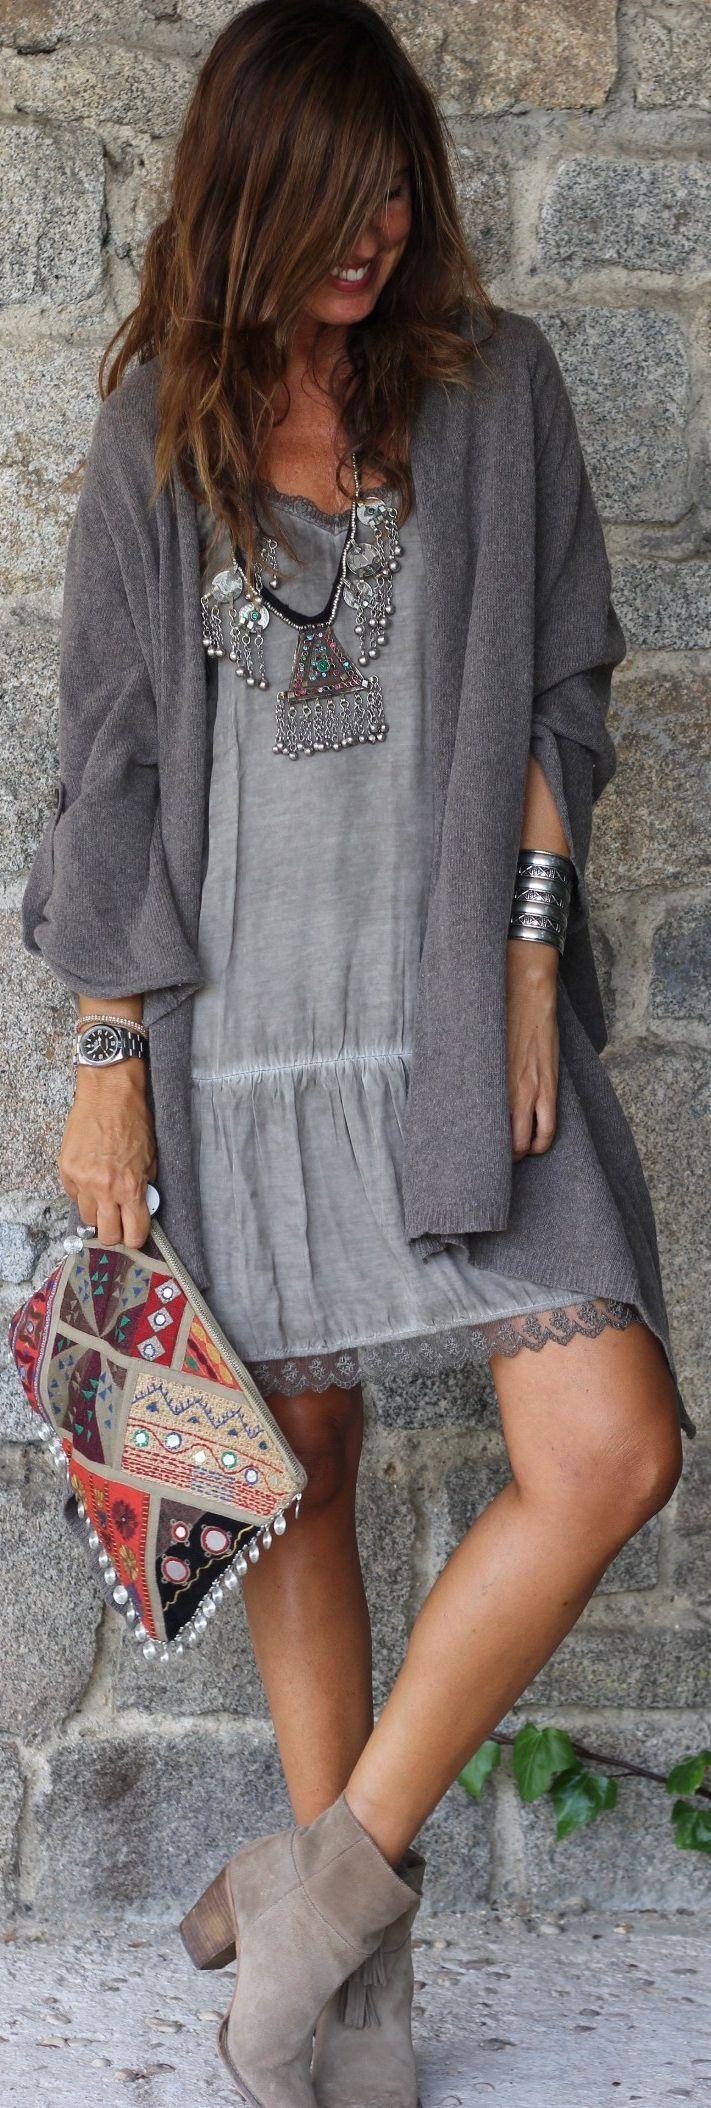 grey colored dress 2